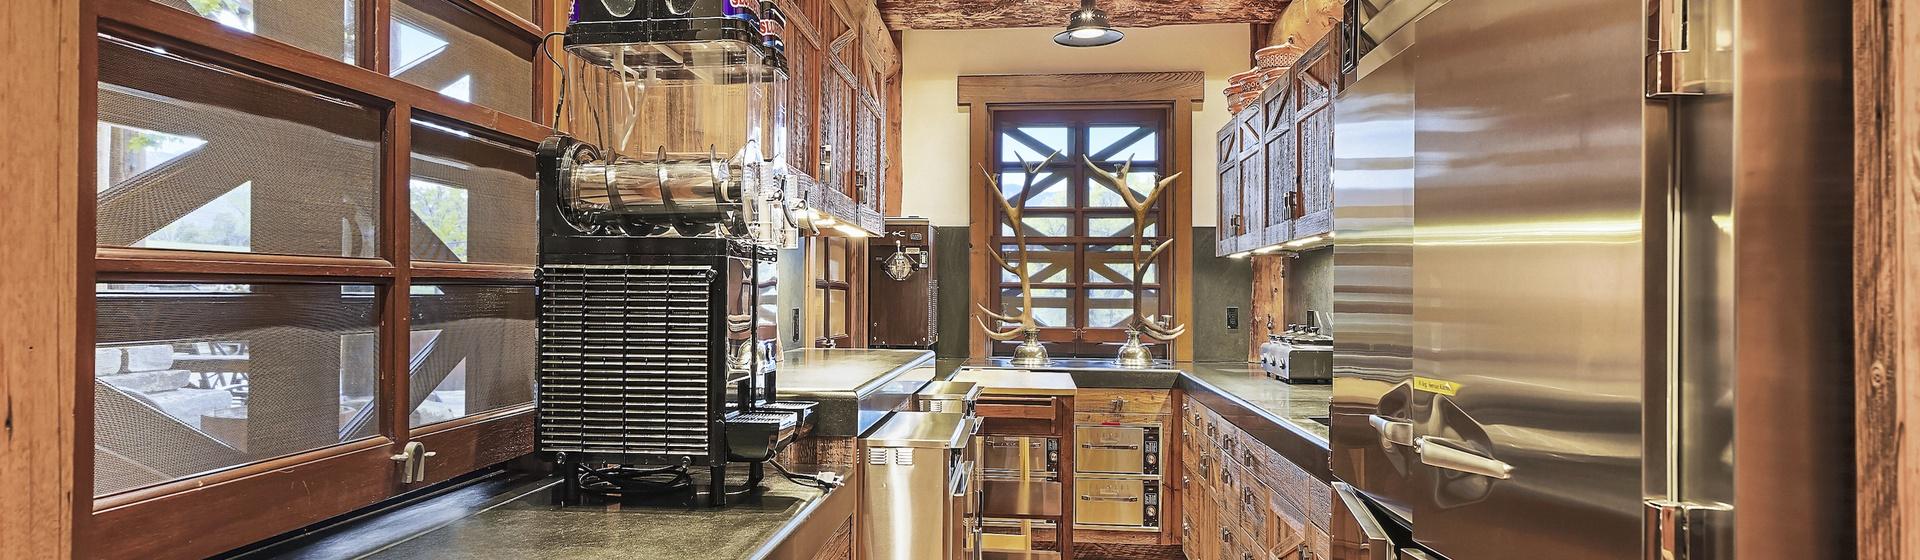 11.4-Telluride-Sleeping-Indian-Ranch-kitchen-service-web.JPG